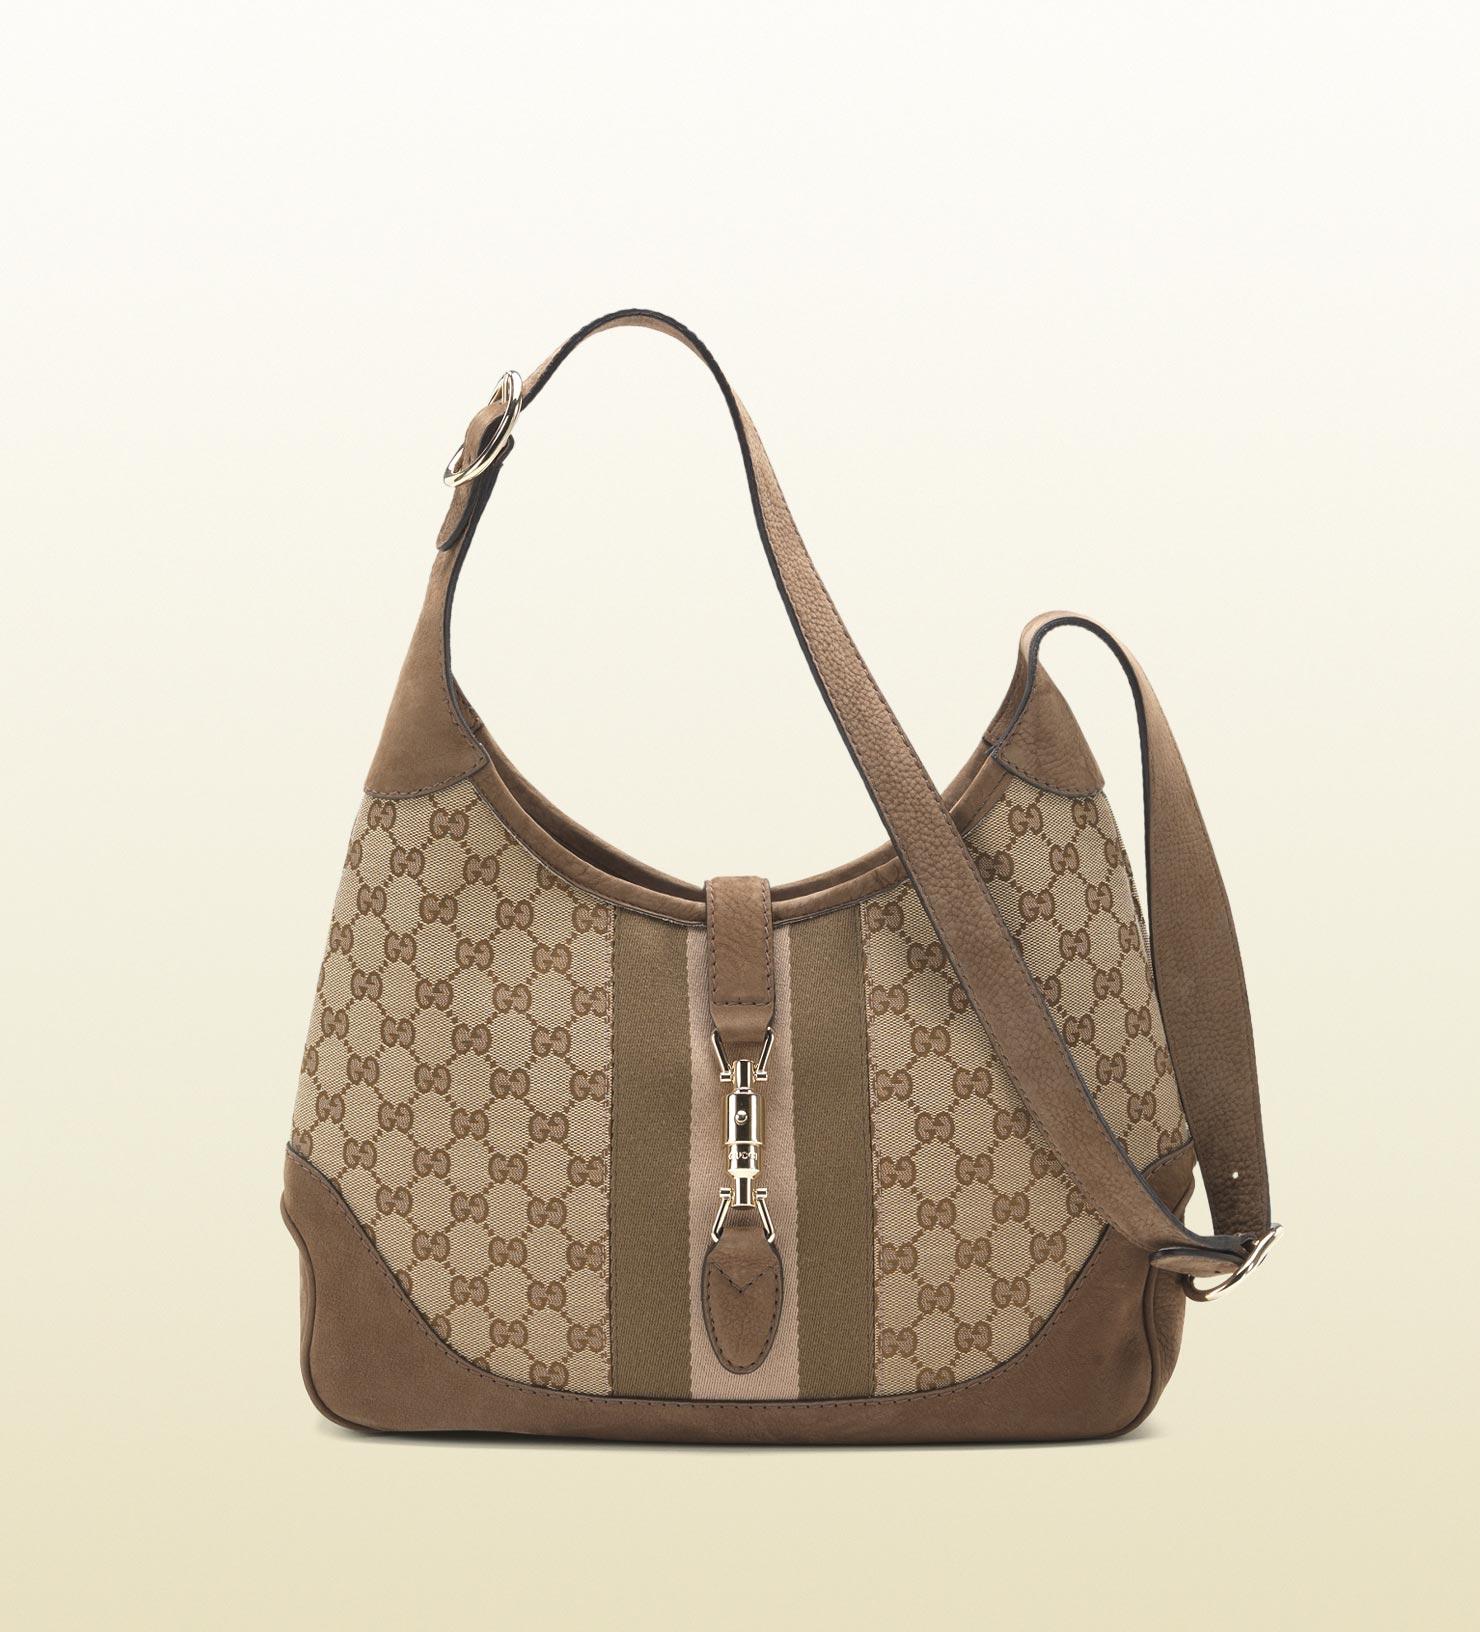 f06dc3e169fa Gucci Jackie Original Gg Canvas Shoulder Bag in Gray - Lyst